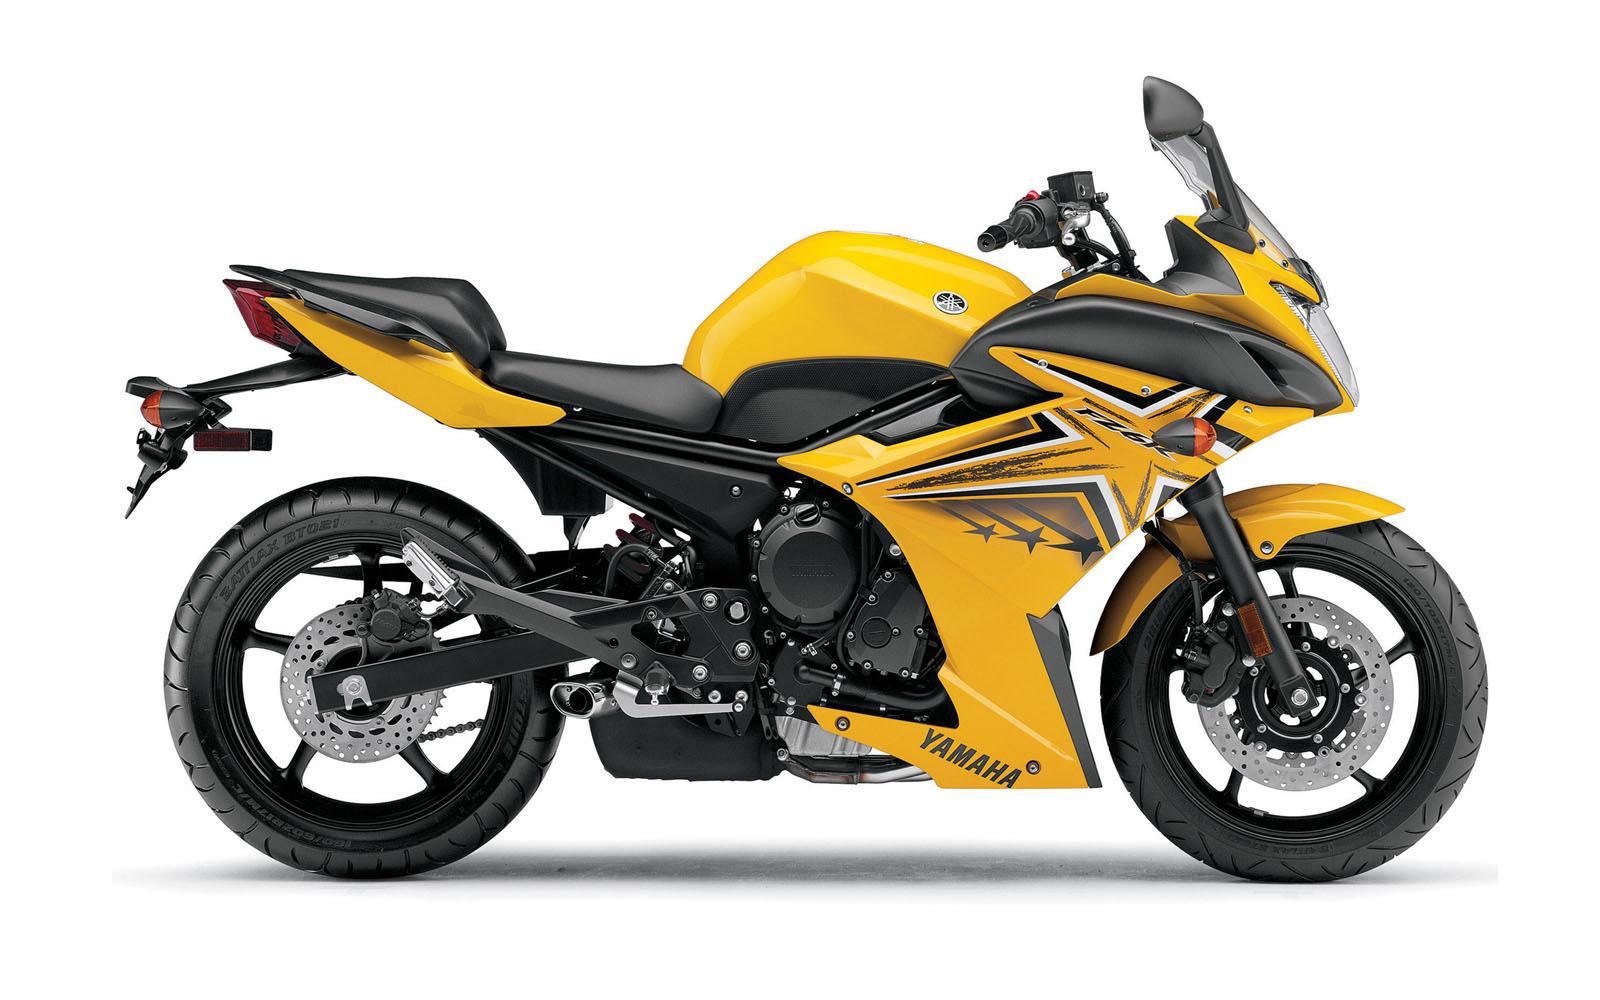 FZ6R Motorcycle Wallpapers Yamaha FZ6R Motorcycle Desktop Wallpapers 1600x1000